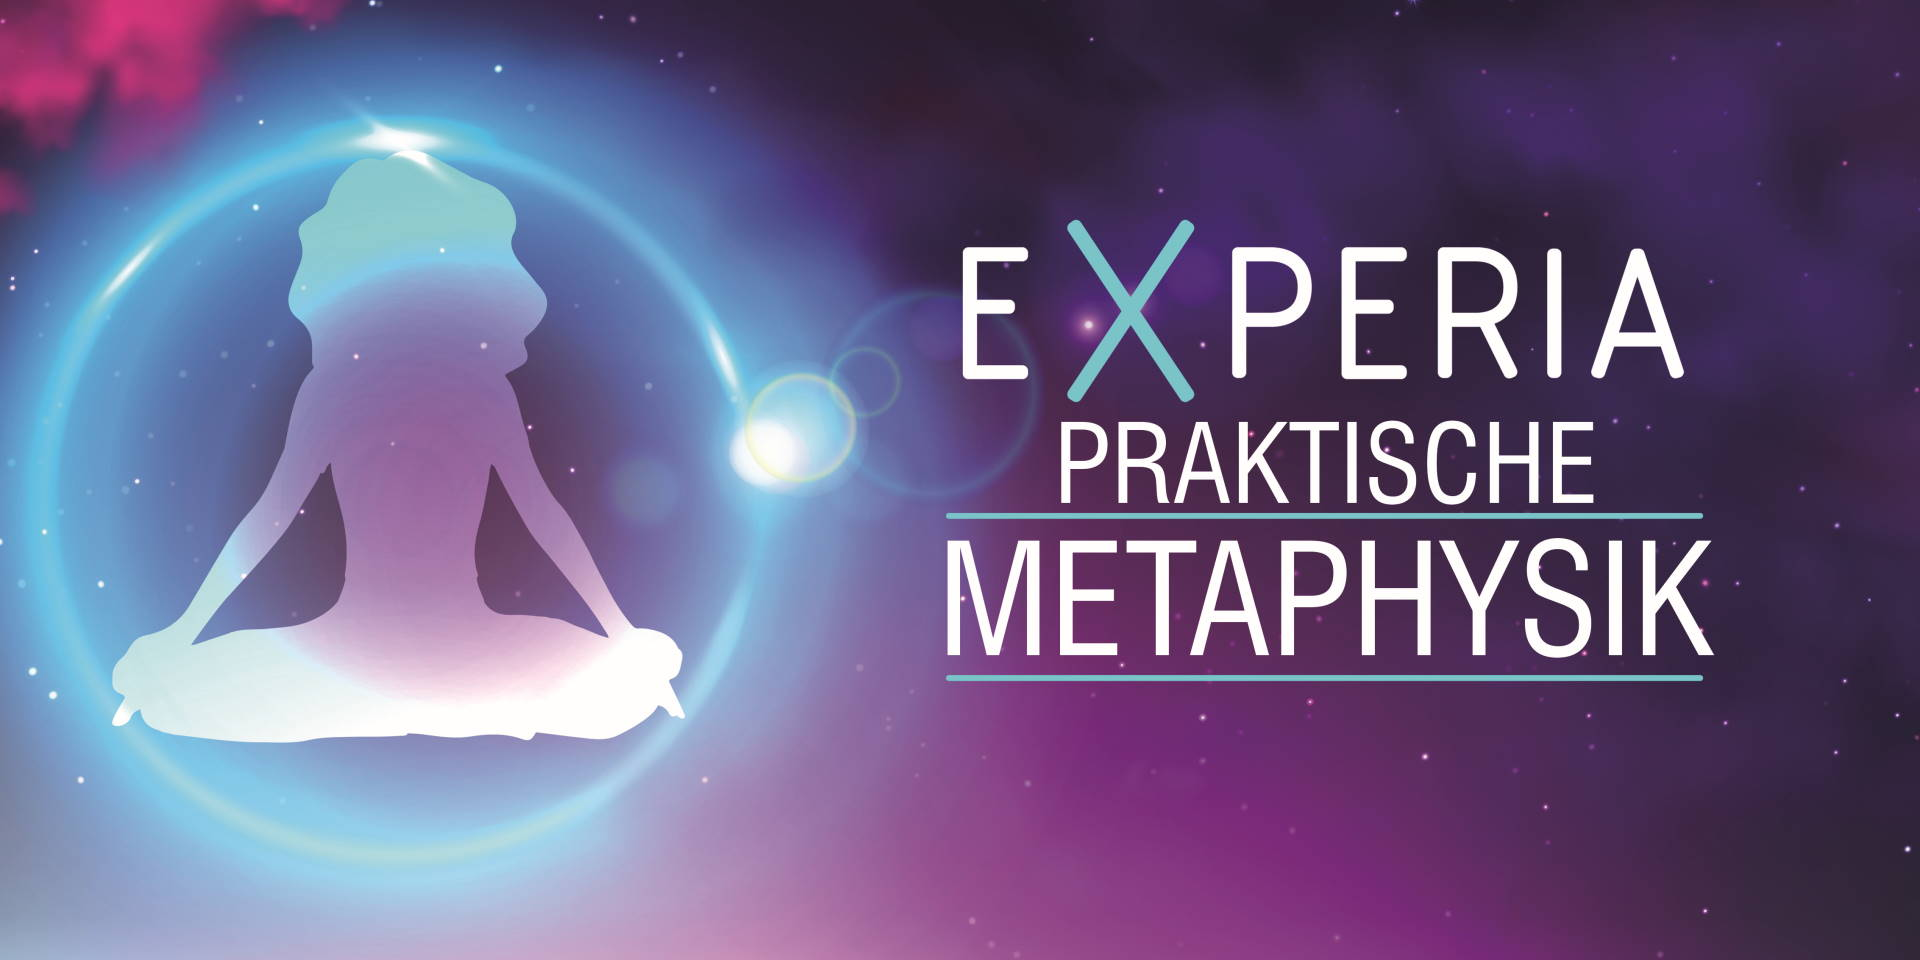 eXperia - praktische Metaphysik